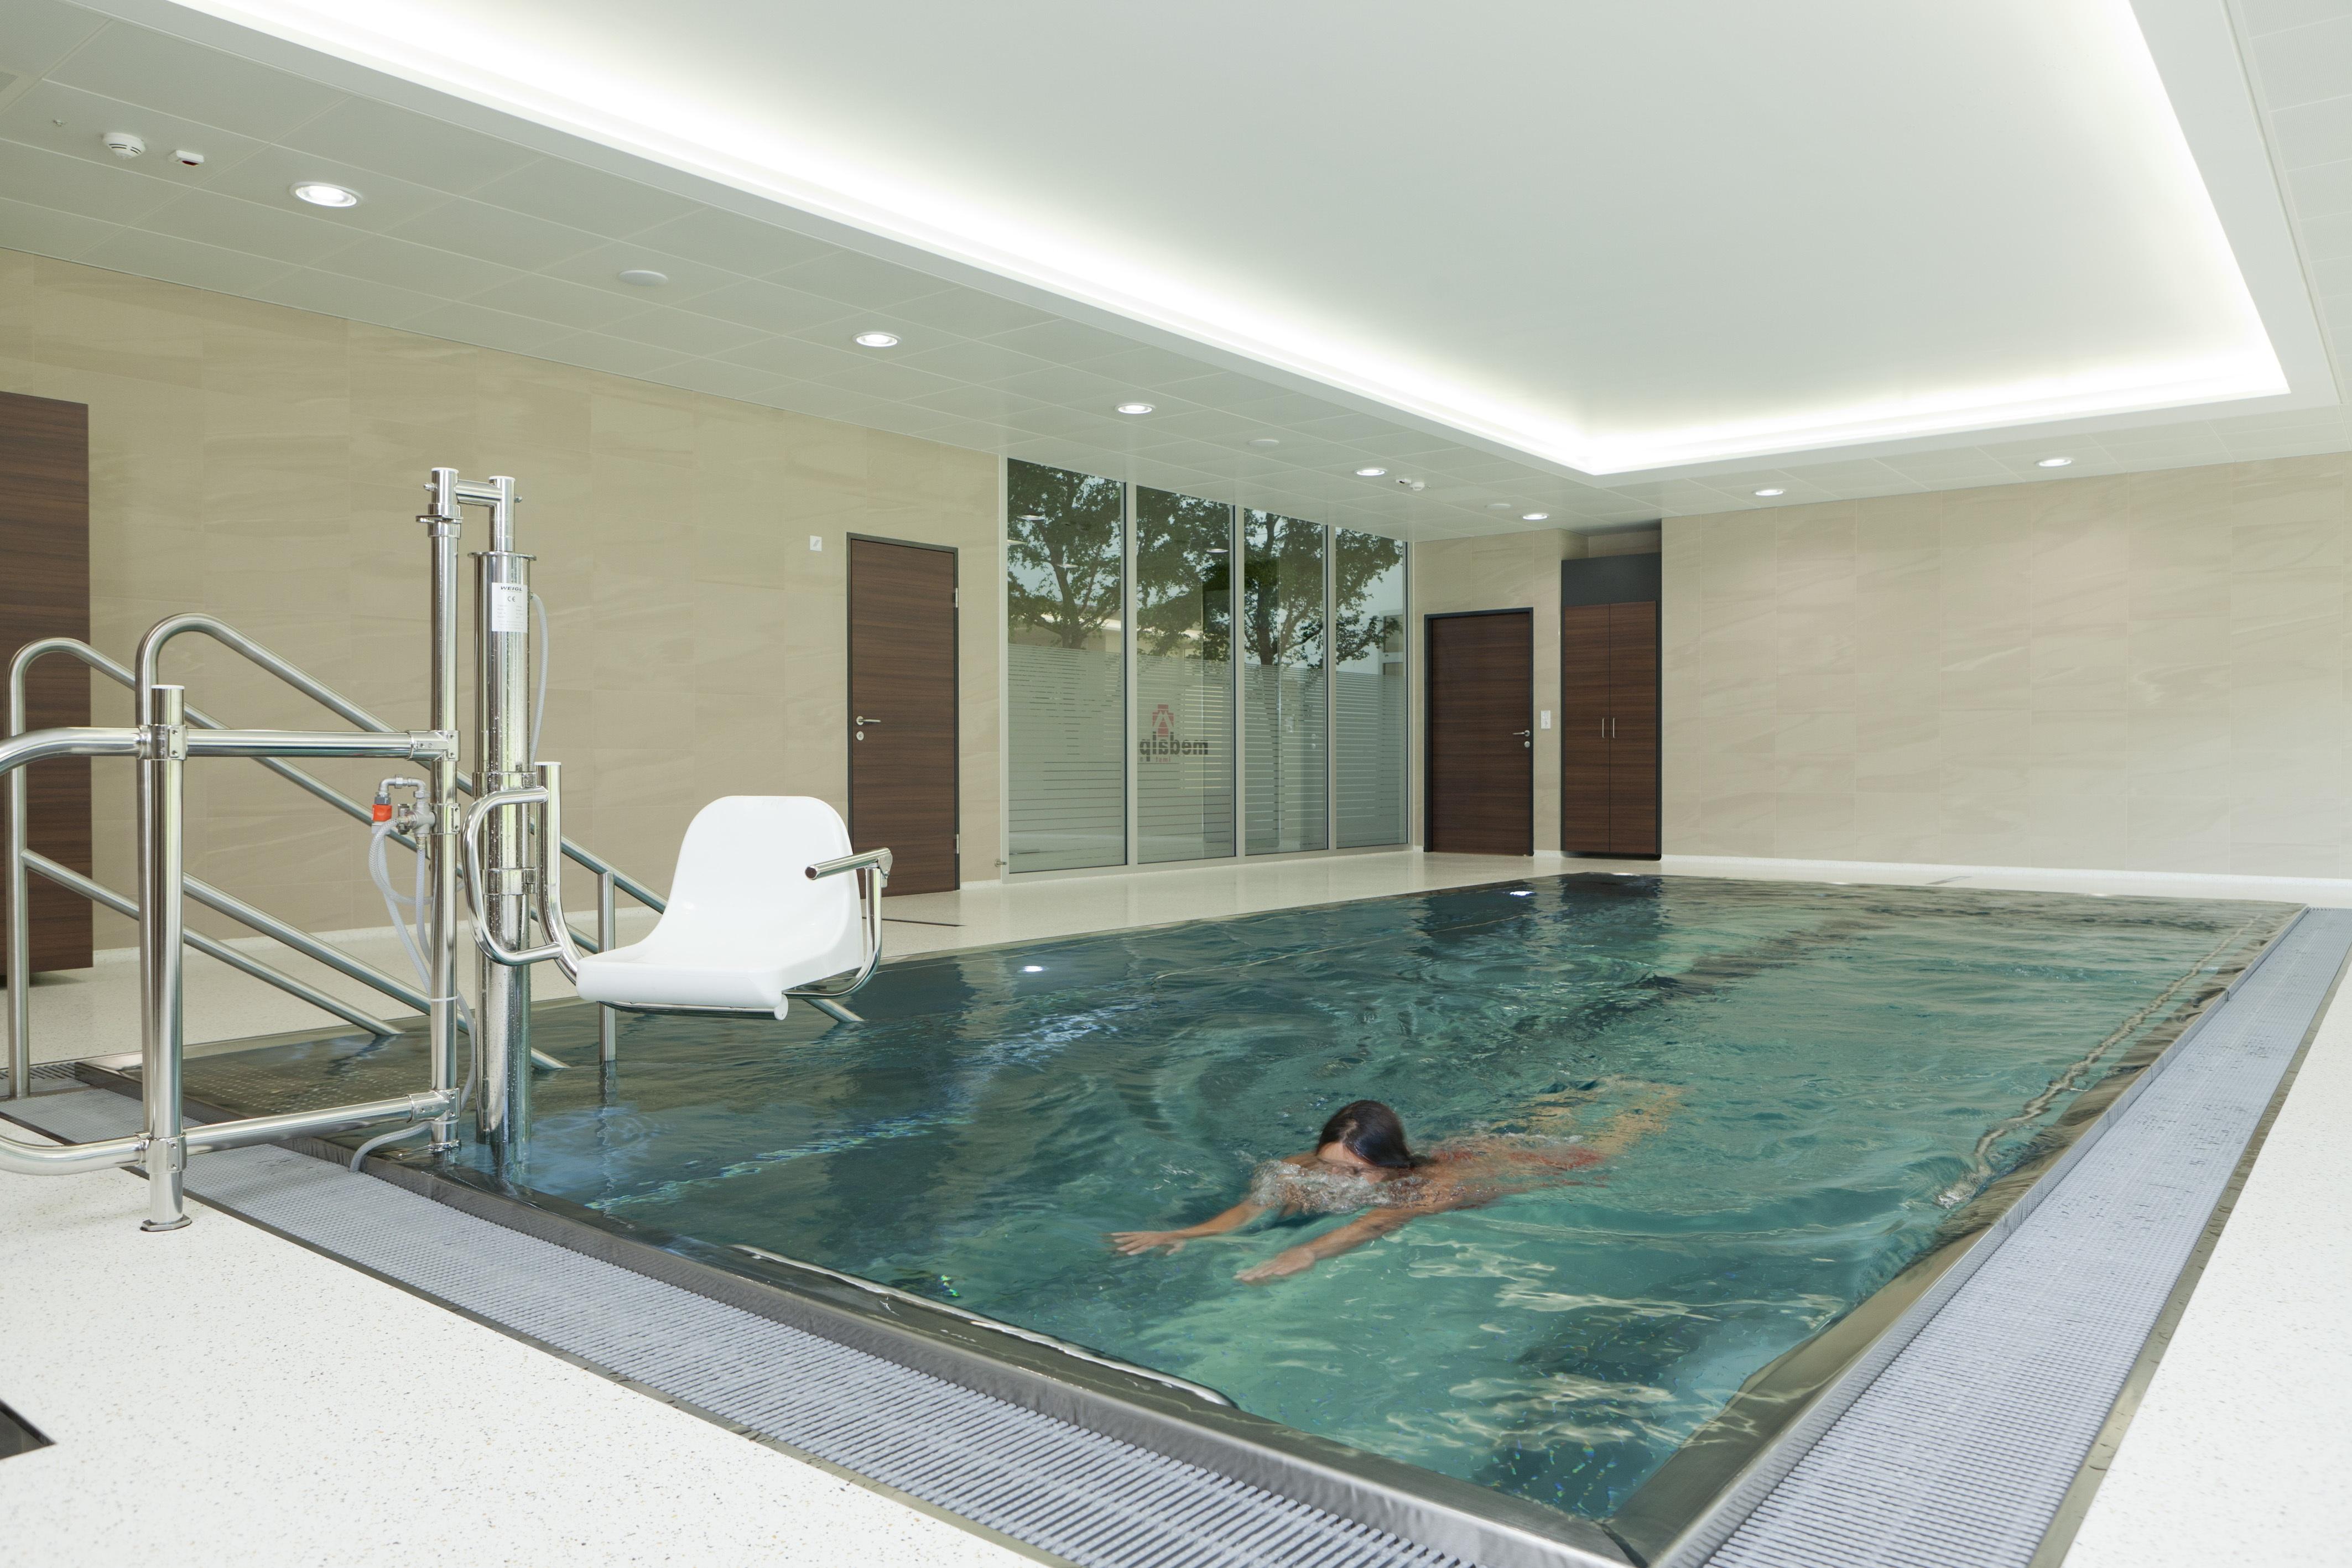 Free Images Villa Floor Swim Swimming Pool Property Room Swimmer Interior Design Condominium Therapy Real Estate Indoor Swimming Pool Leisure Centre 4252x2835 921877 Free Stock Photos Pxhere